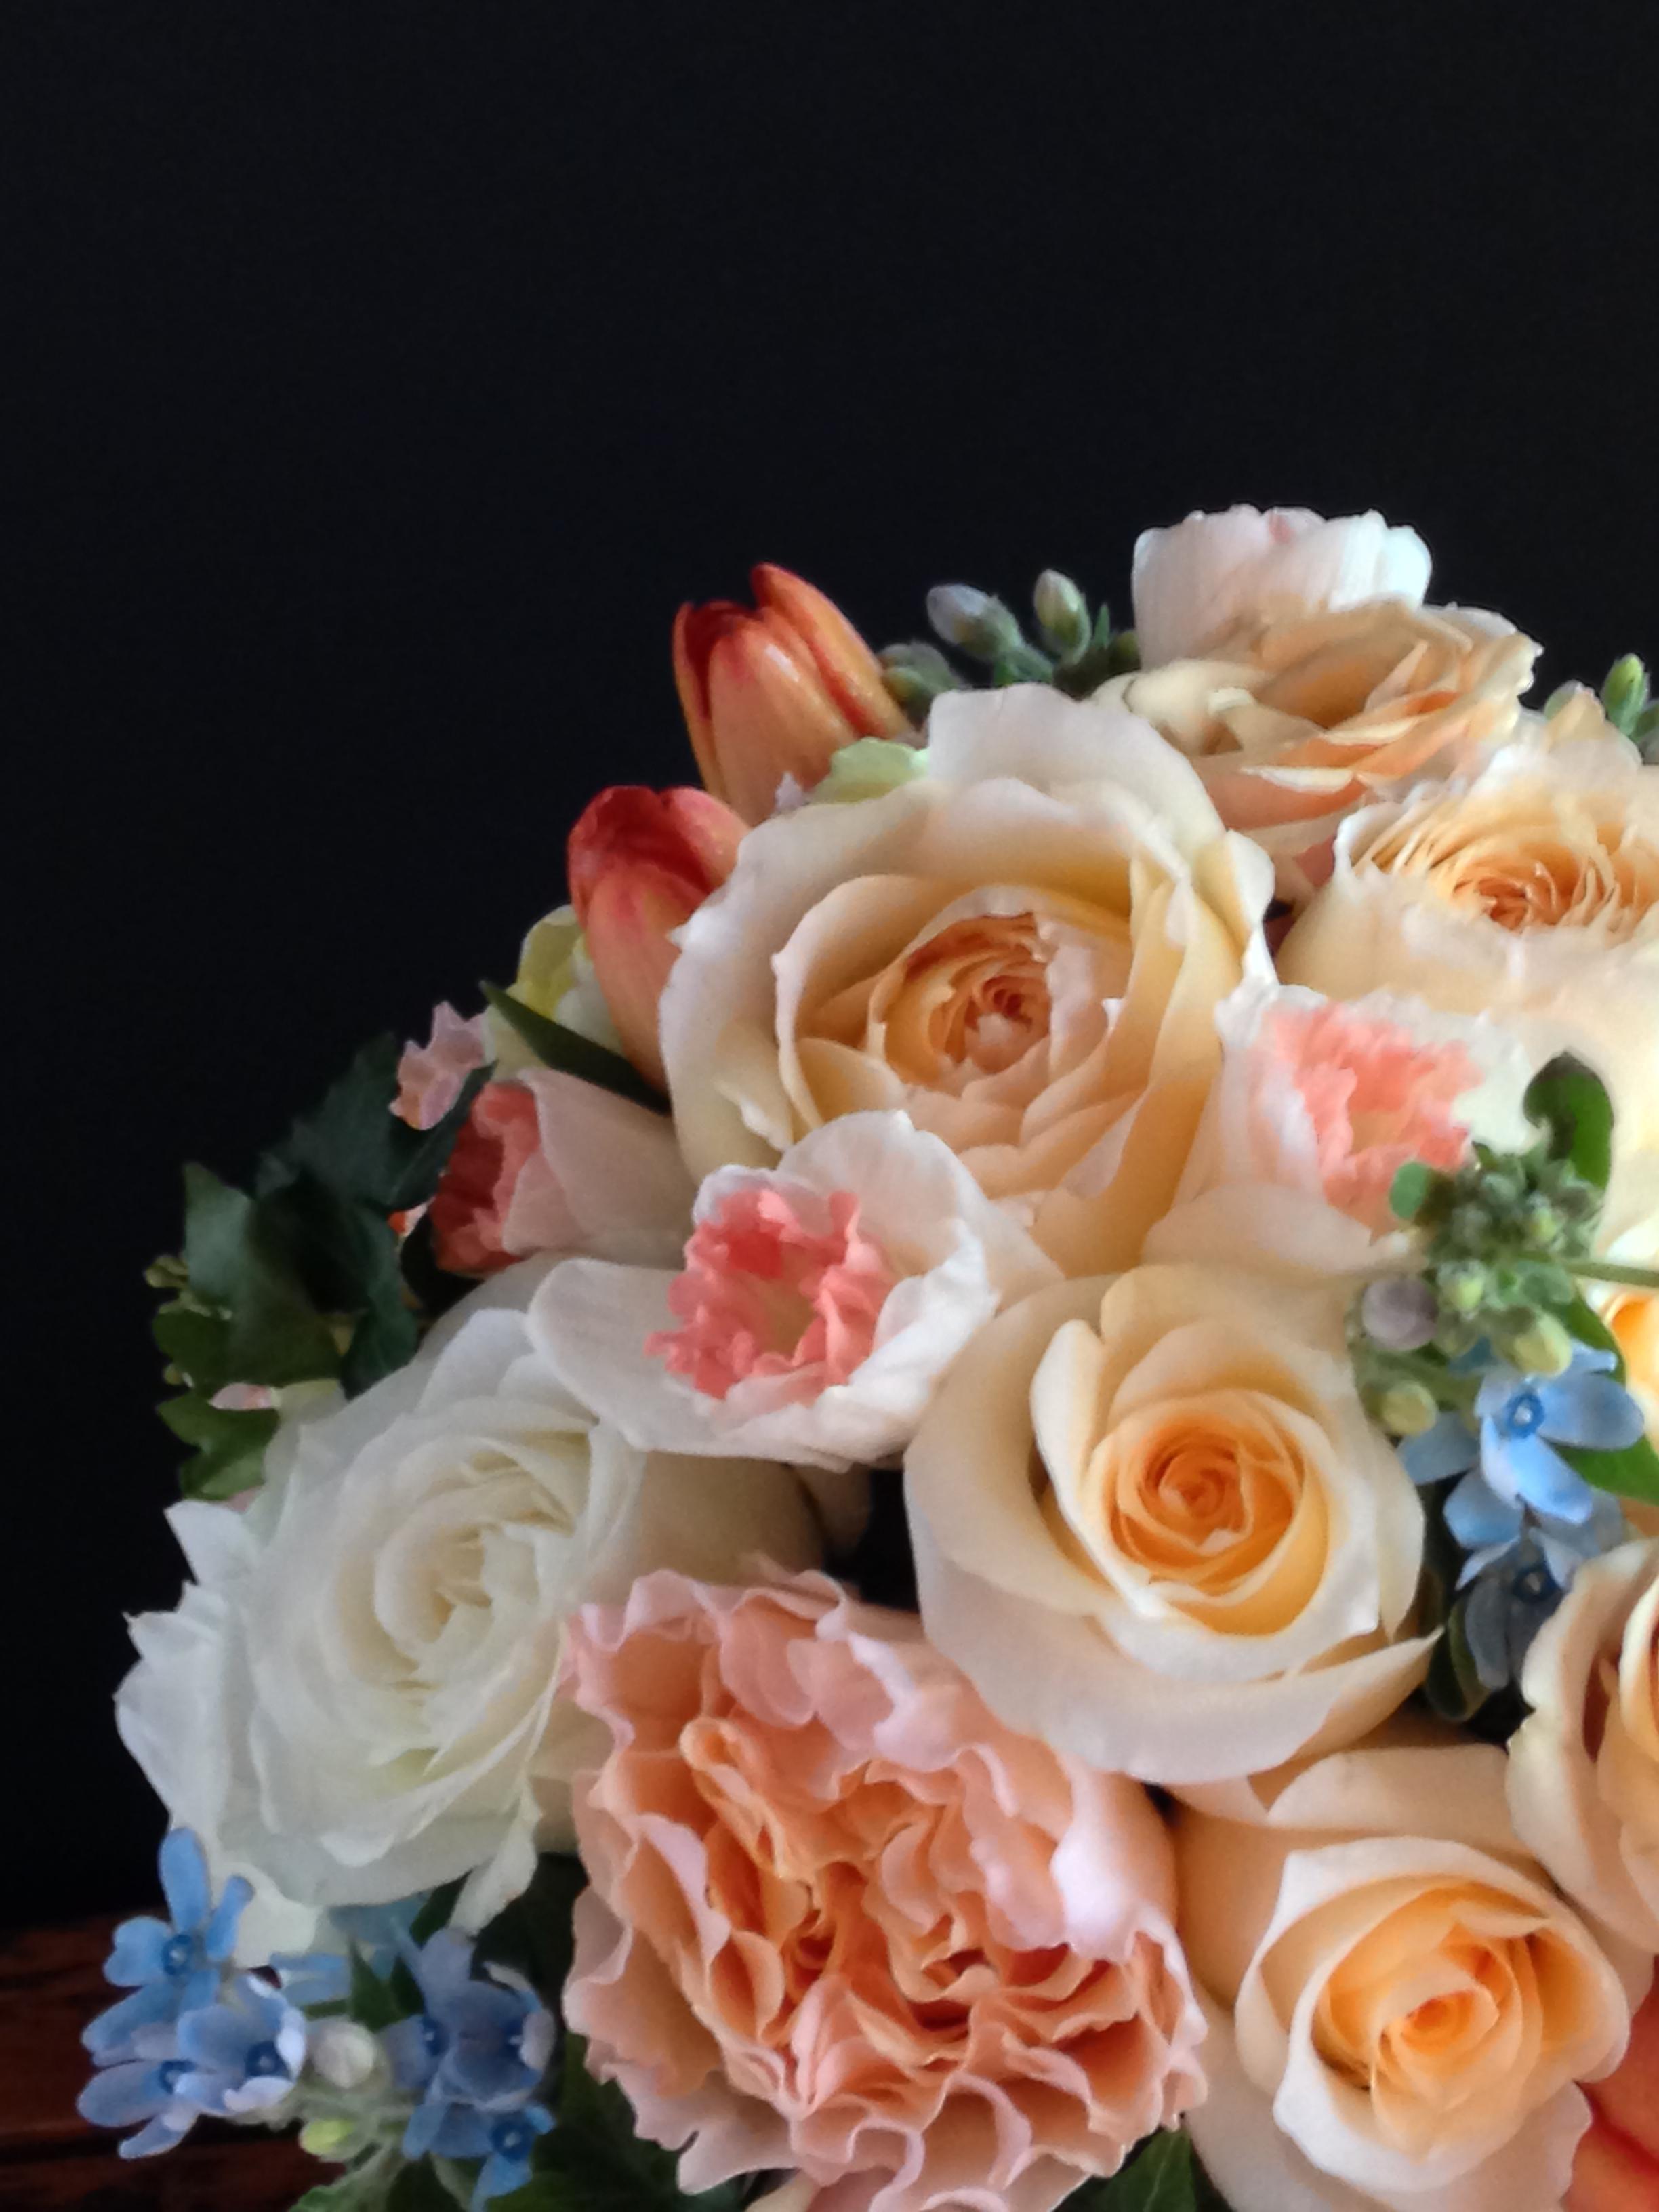 Photo by Catherine G. Damwood LLC, Image of Brides Bouquet